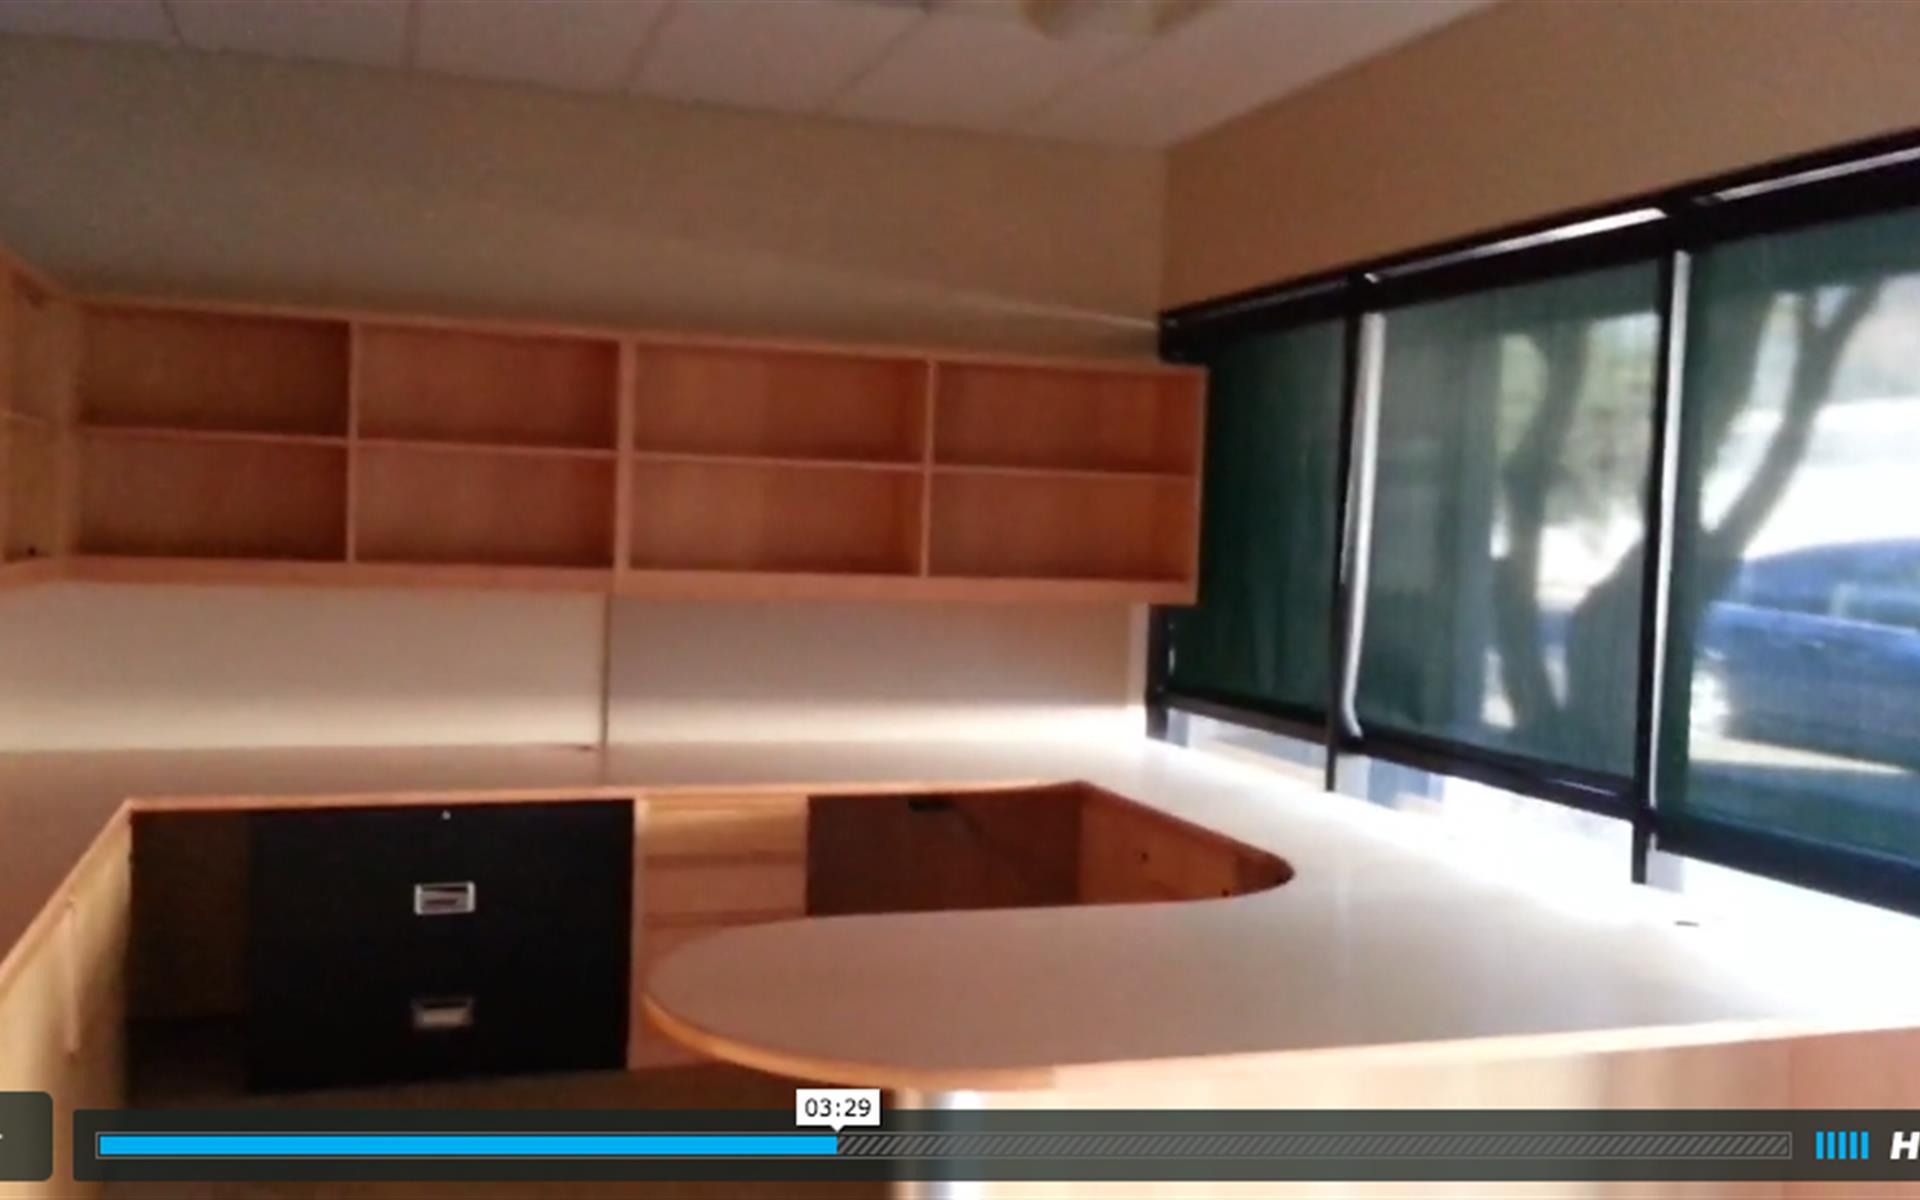 SOS Entertainment - Team Suite w/ 7 Offices